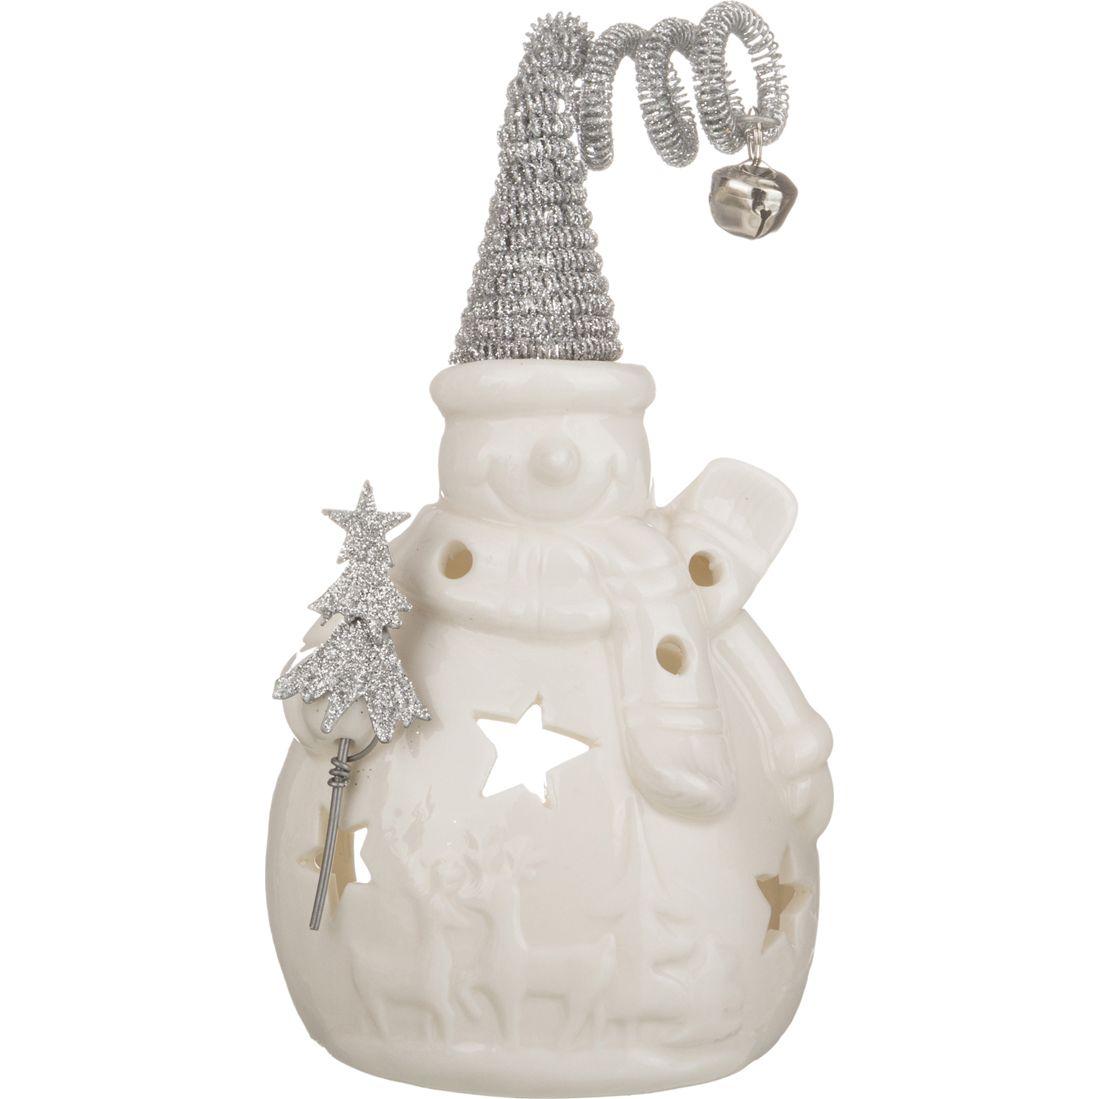 Купить Статуэтки и фигурки Lefard, Фигурка Снеговик (10х7х17 см), Китай, Белый, Серый, Металл, Керамика